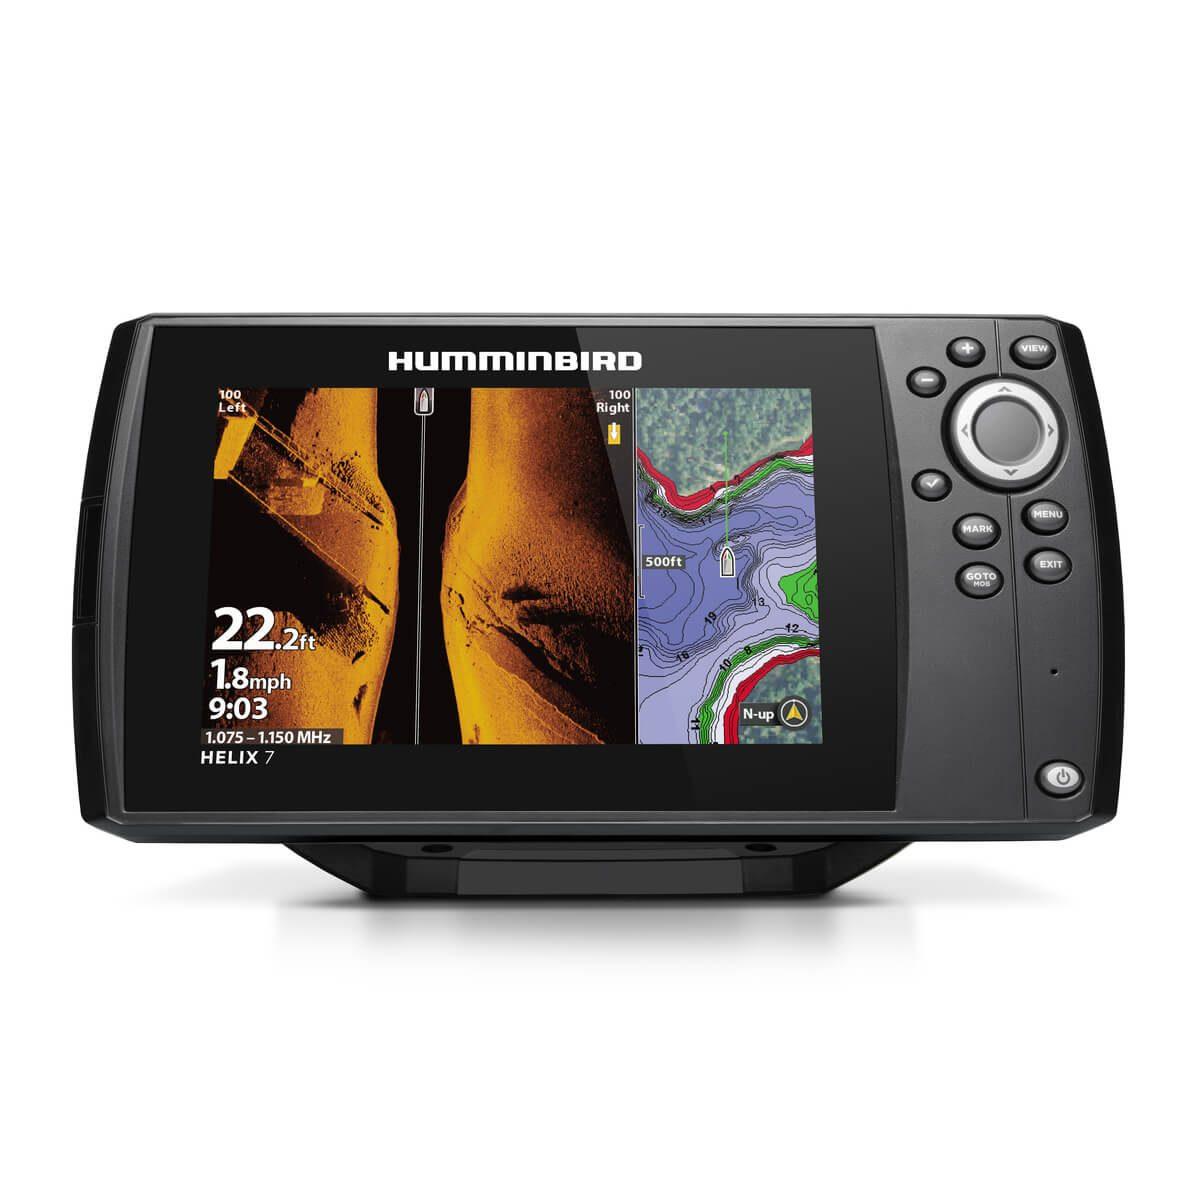 HELIX 7 CHIRP MEGA SI GPS G3 - 104562